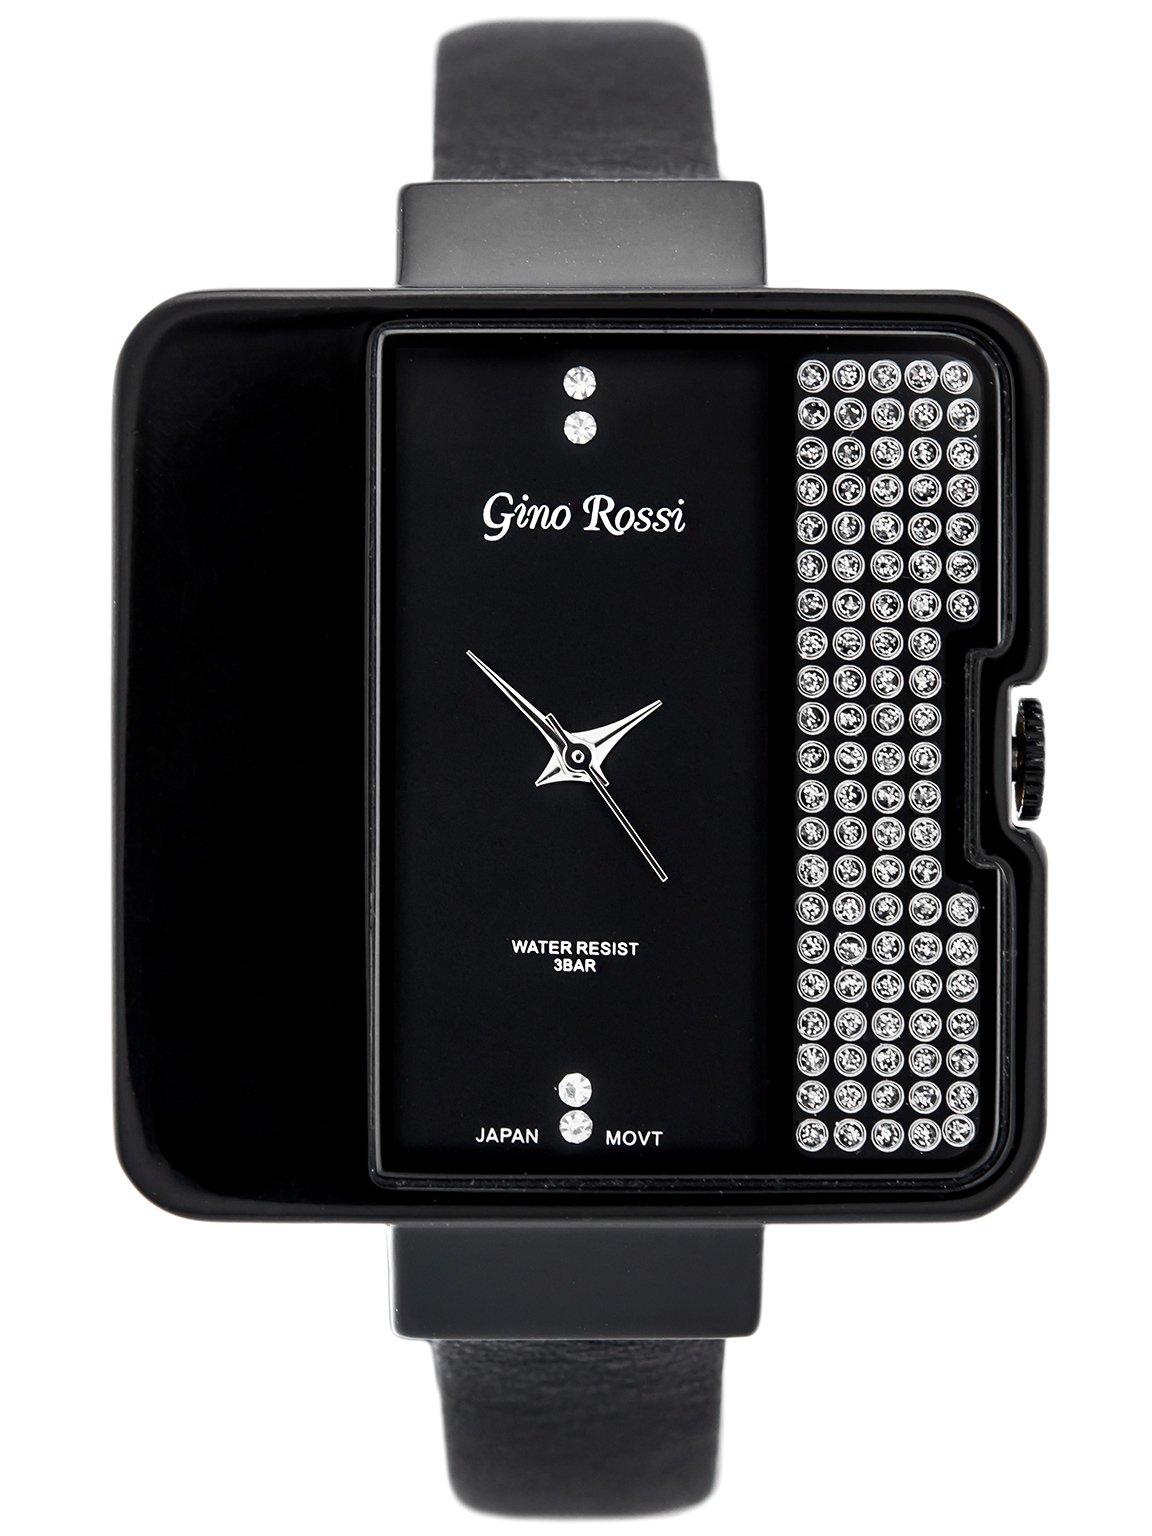 29f8c669d0538 Zegarek damski GINO ROSSI 6632 1CC 88,00 zł cena tanio najtaniej ...